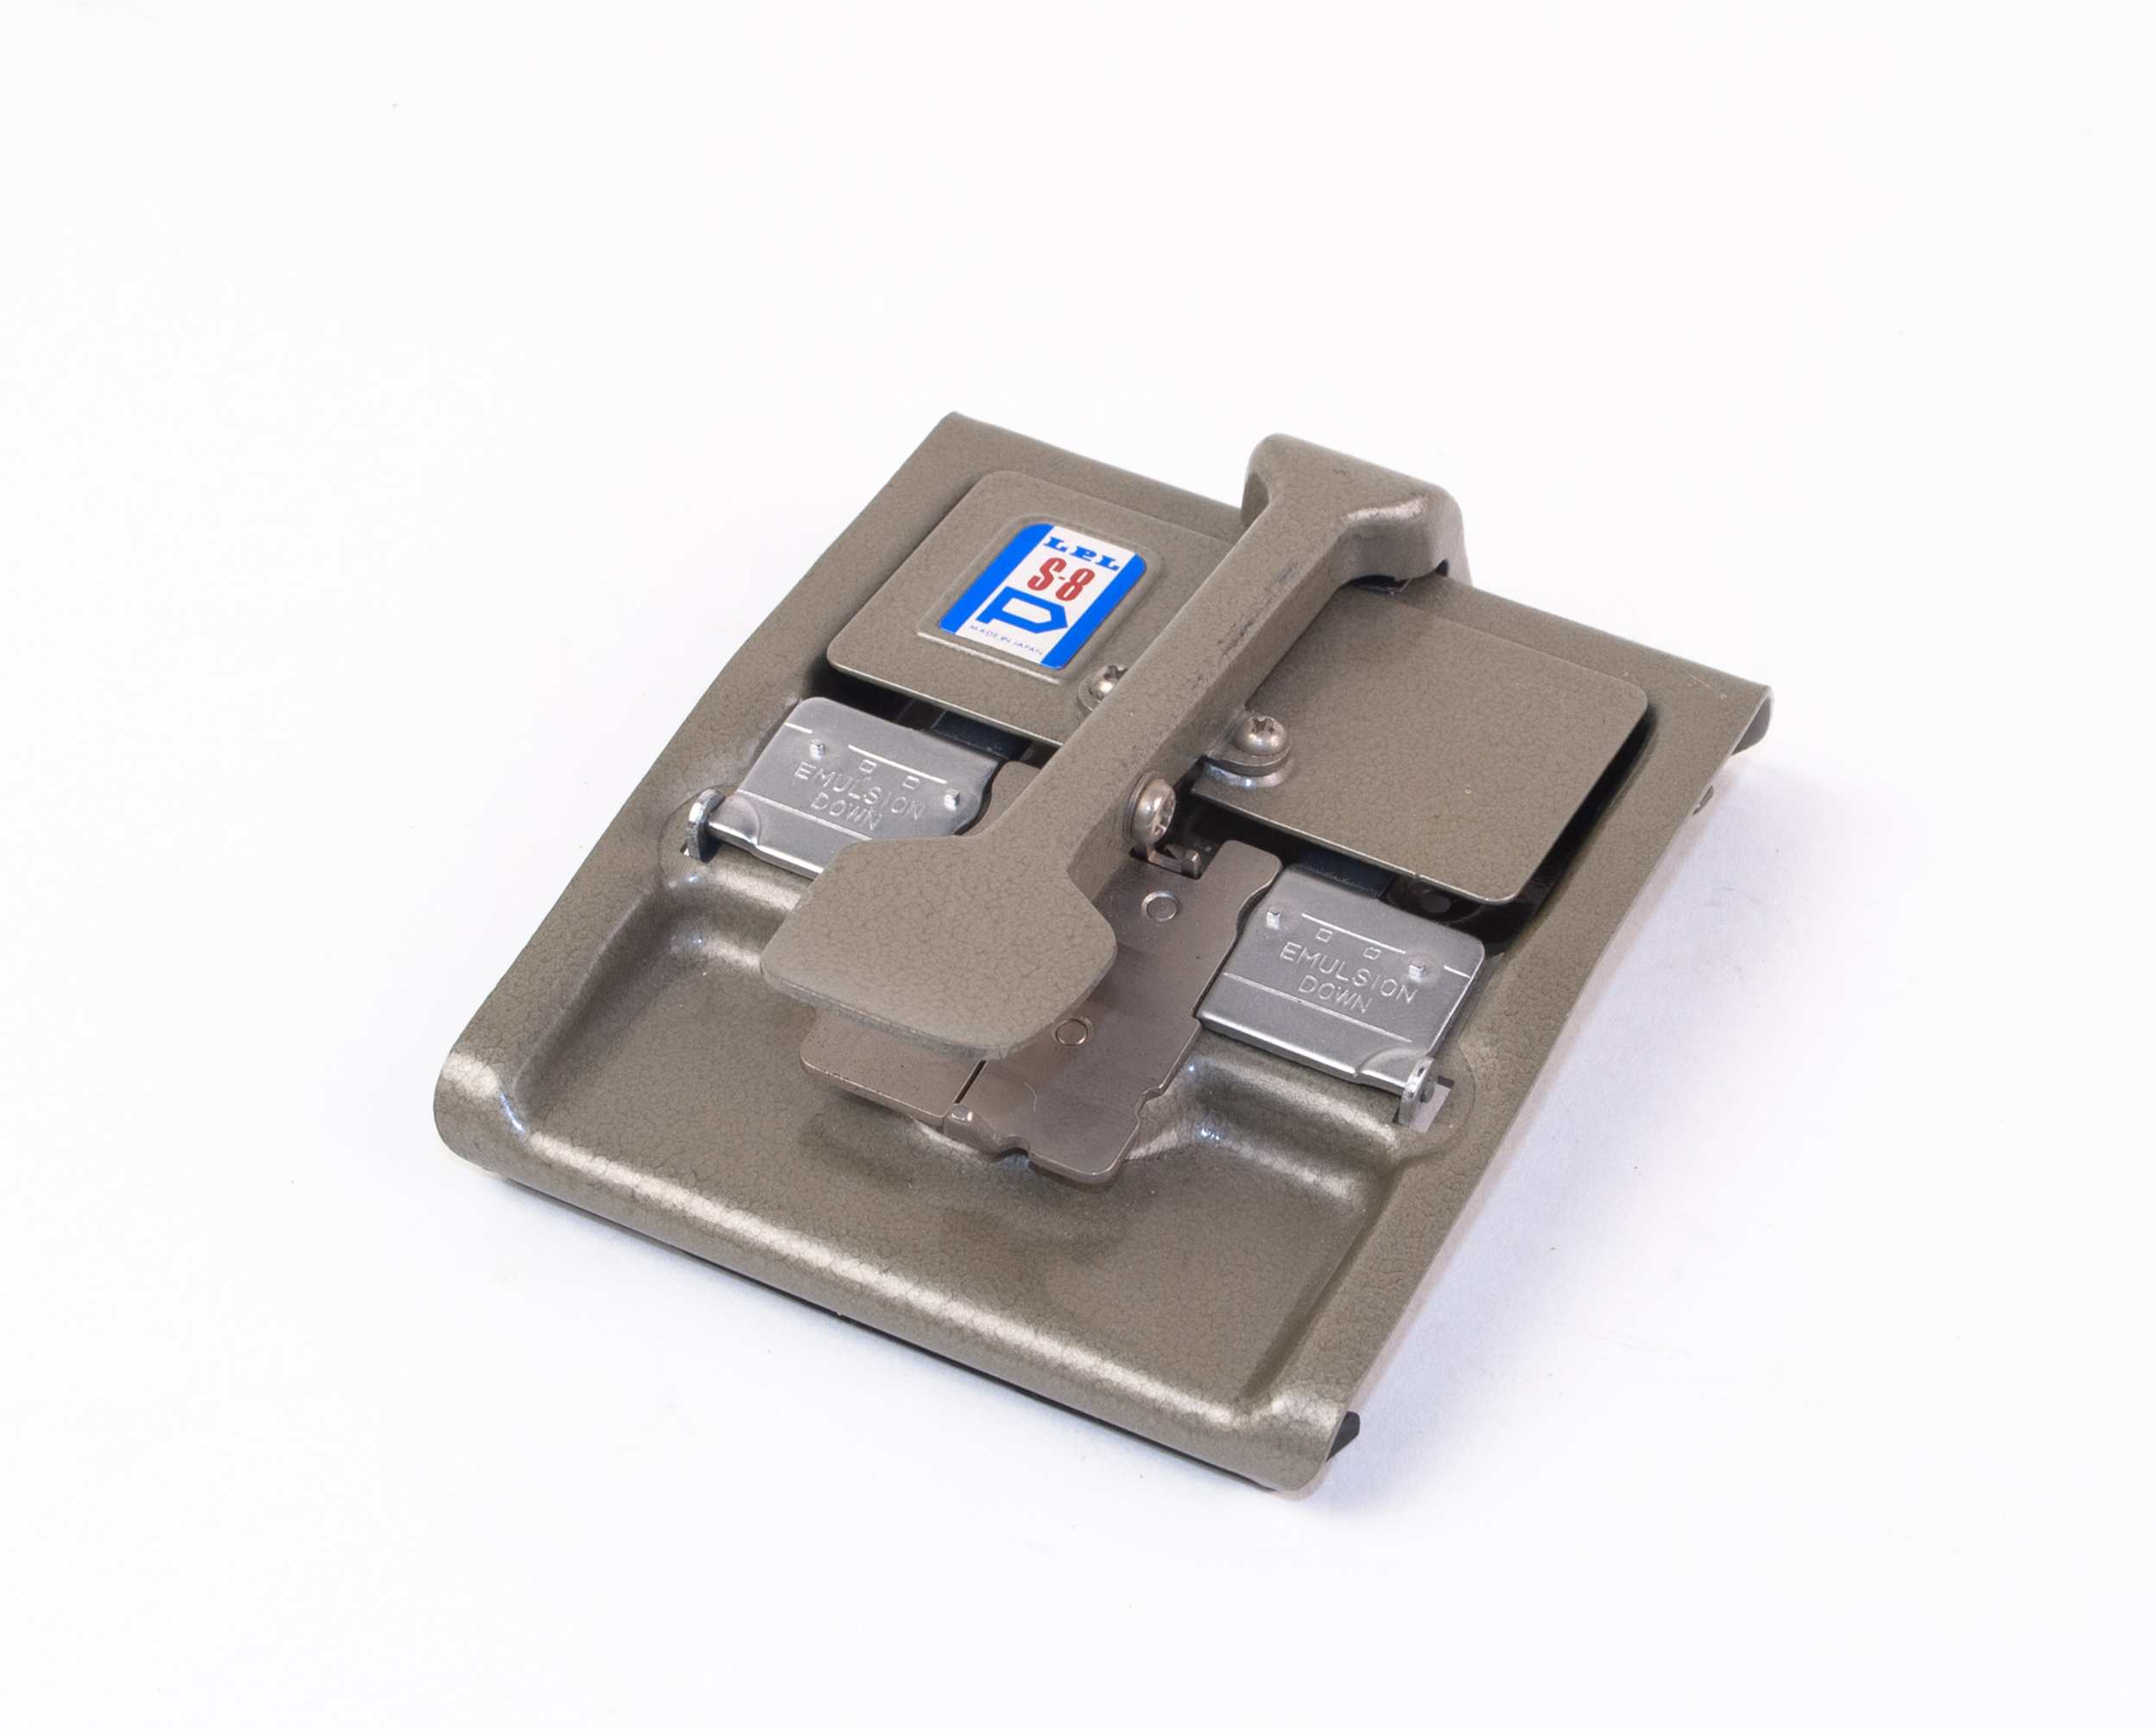 S-8 Patch tape splicer